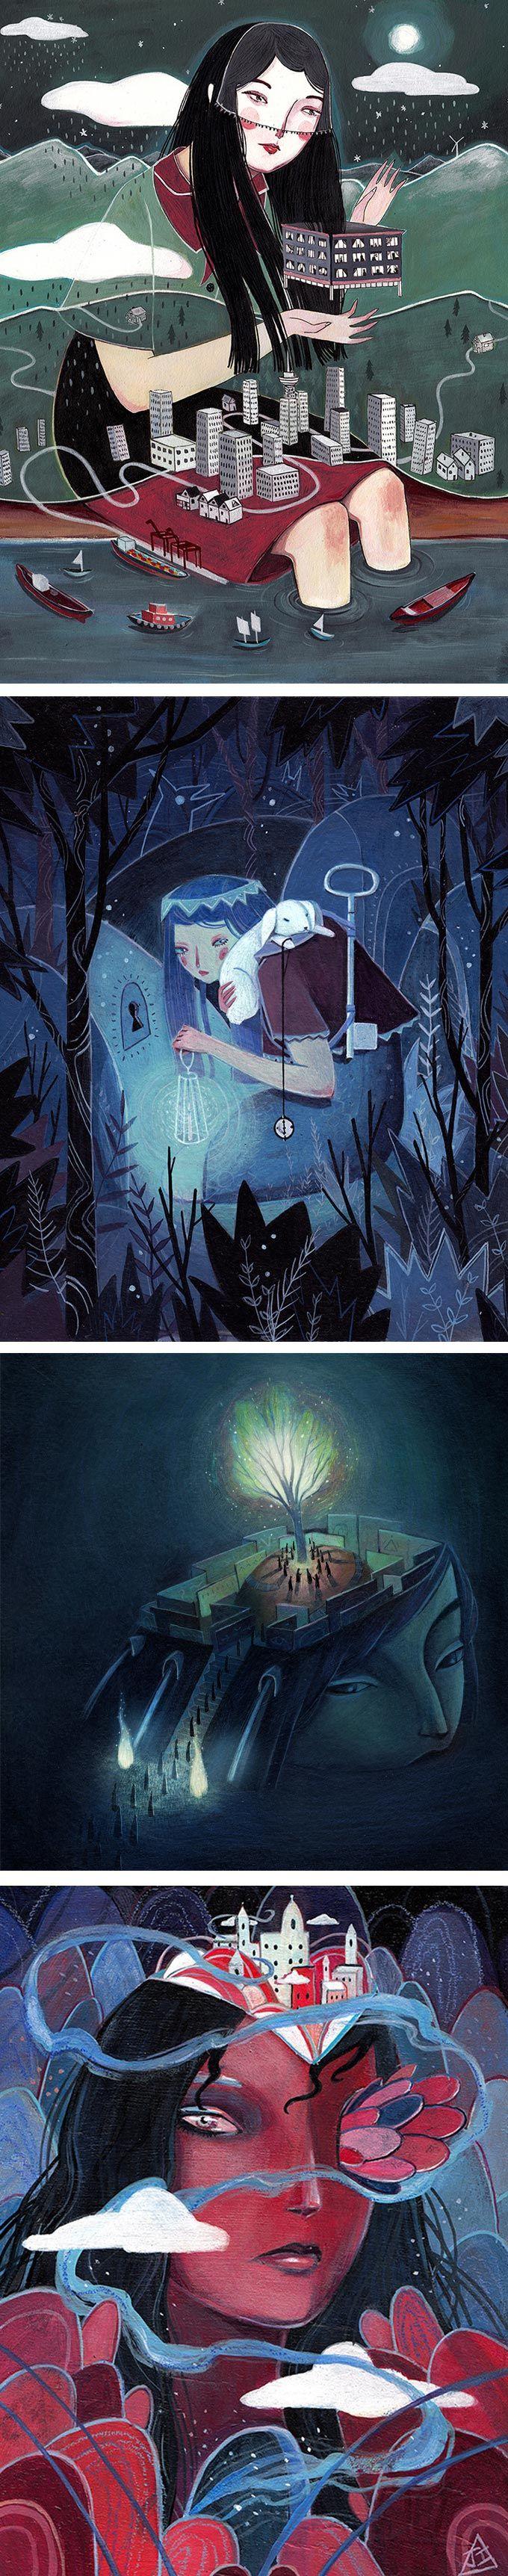 Julia Iredale   surreal illustration   illustrations of women   fairy tale art